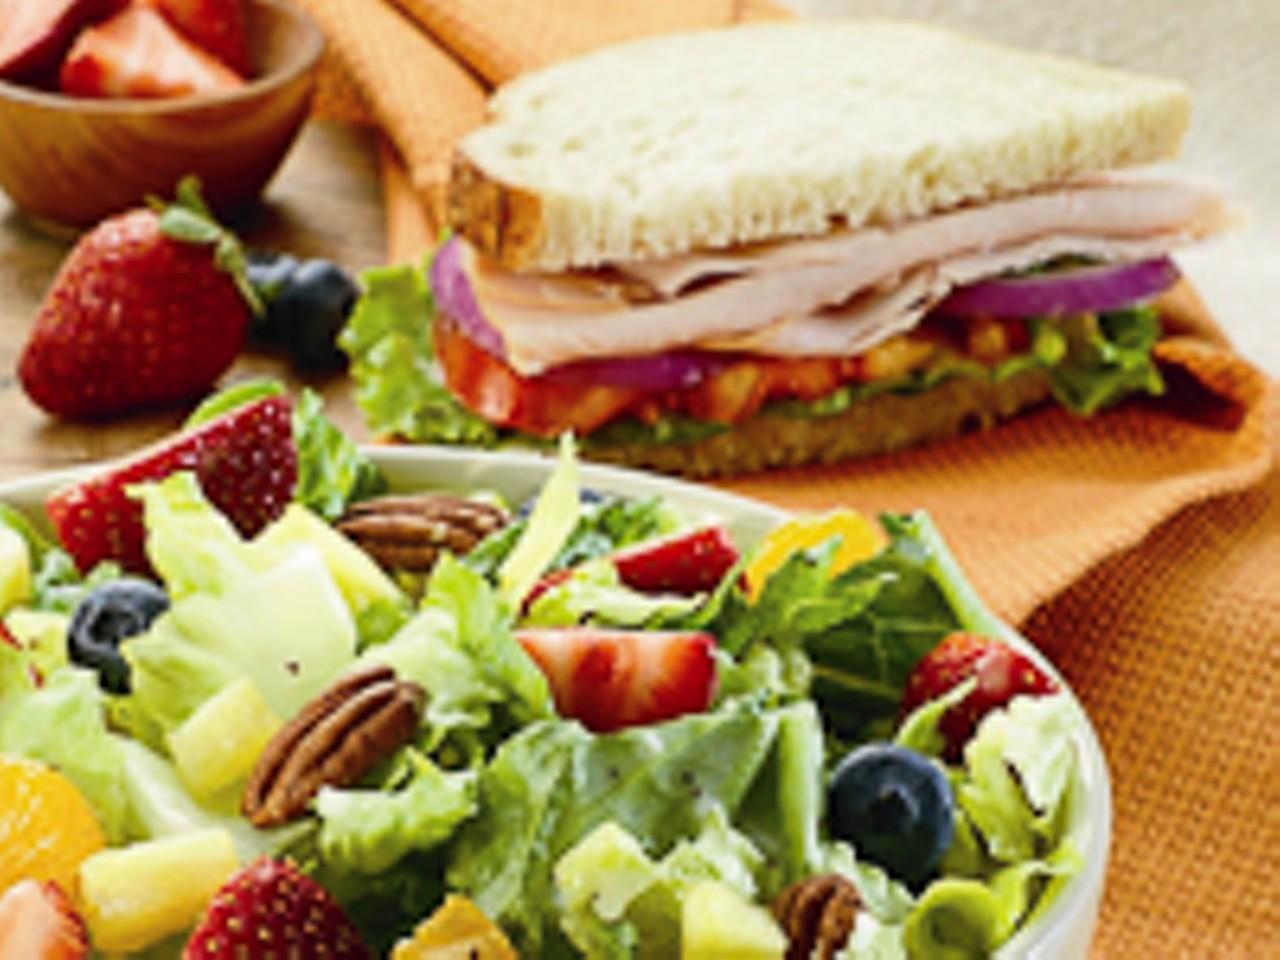 Best Lunch Restaurants Chesterfield Mo